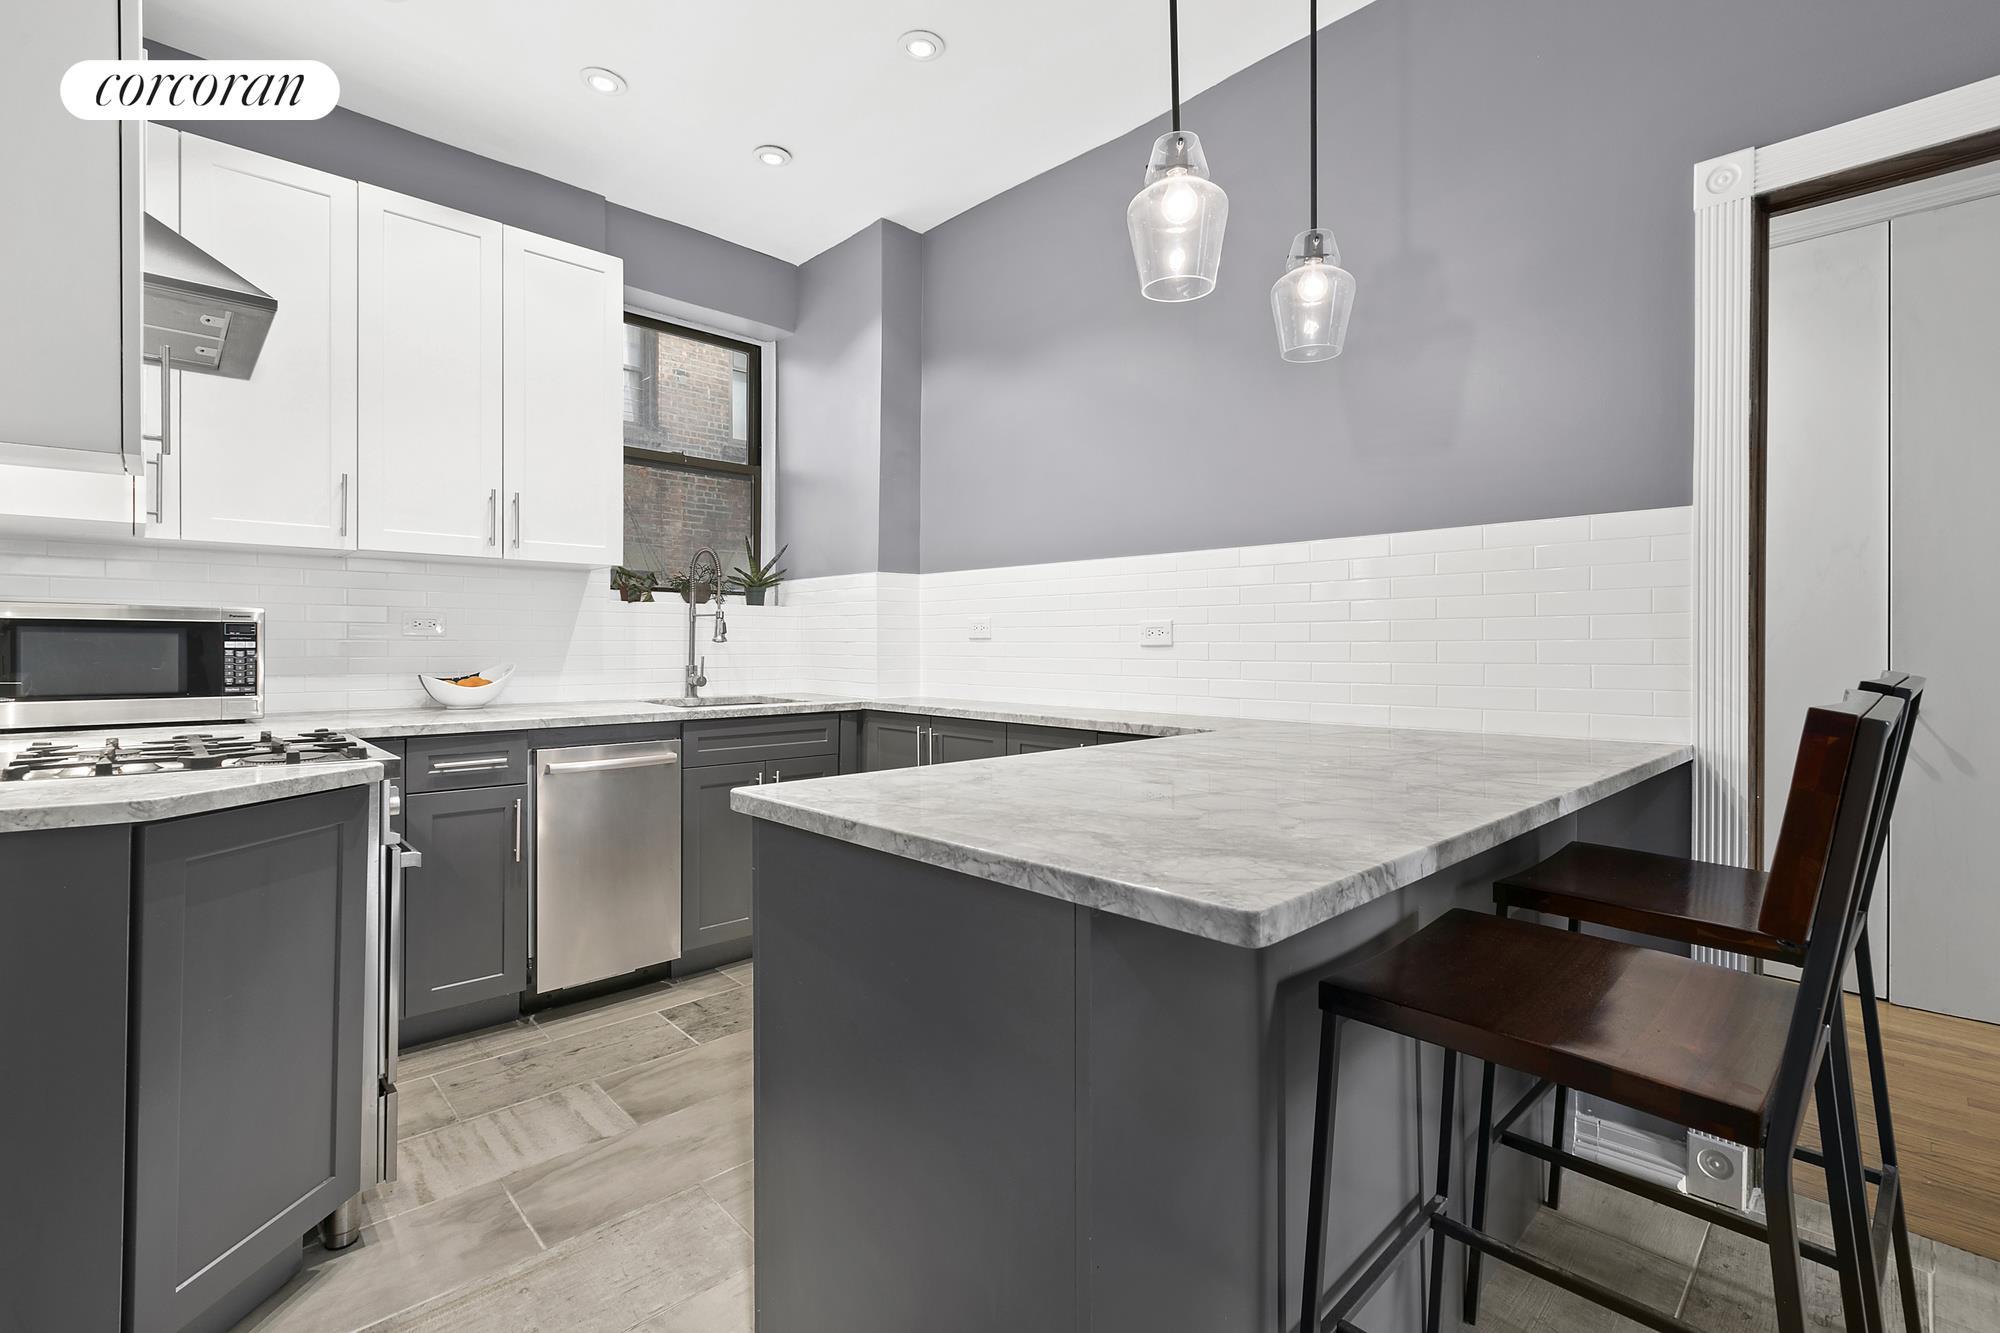 Corcoran, 404 West 48th Street, Apt. 3B, Clinton Real Estate ...